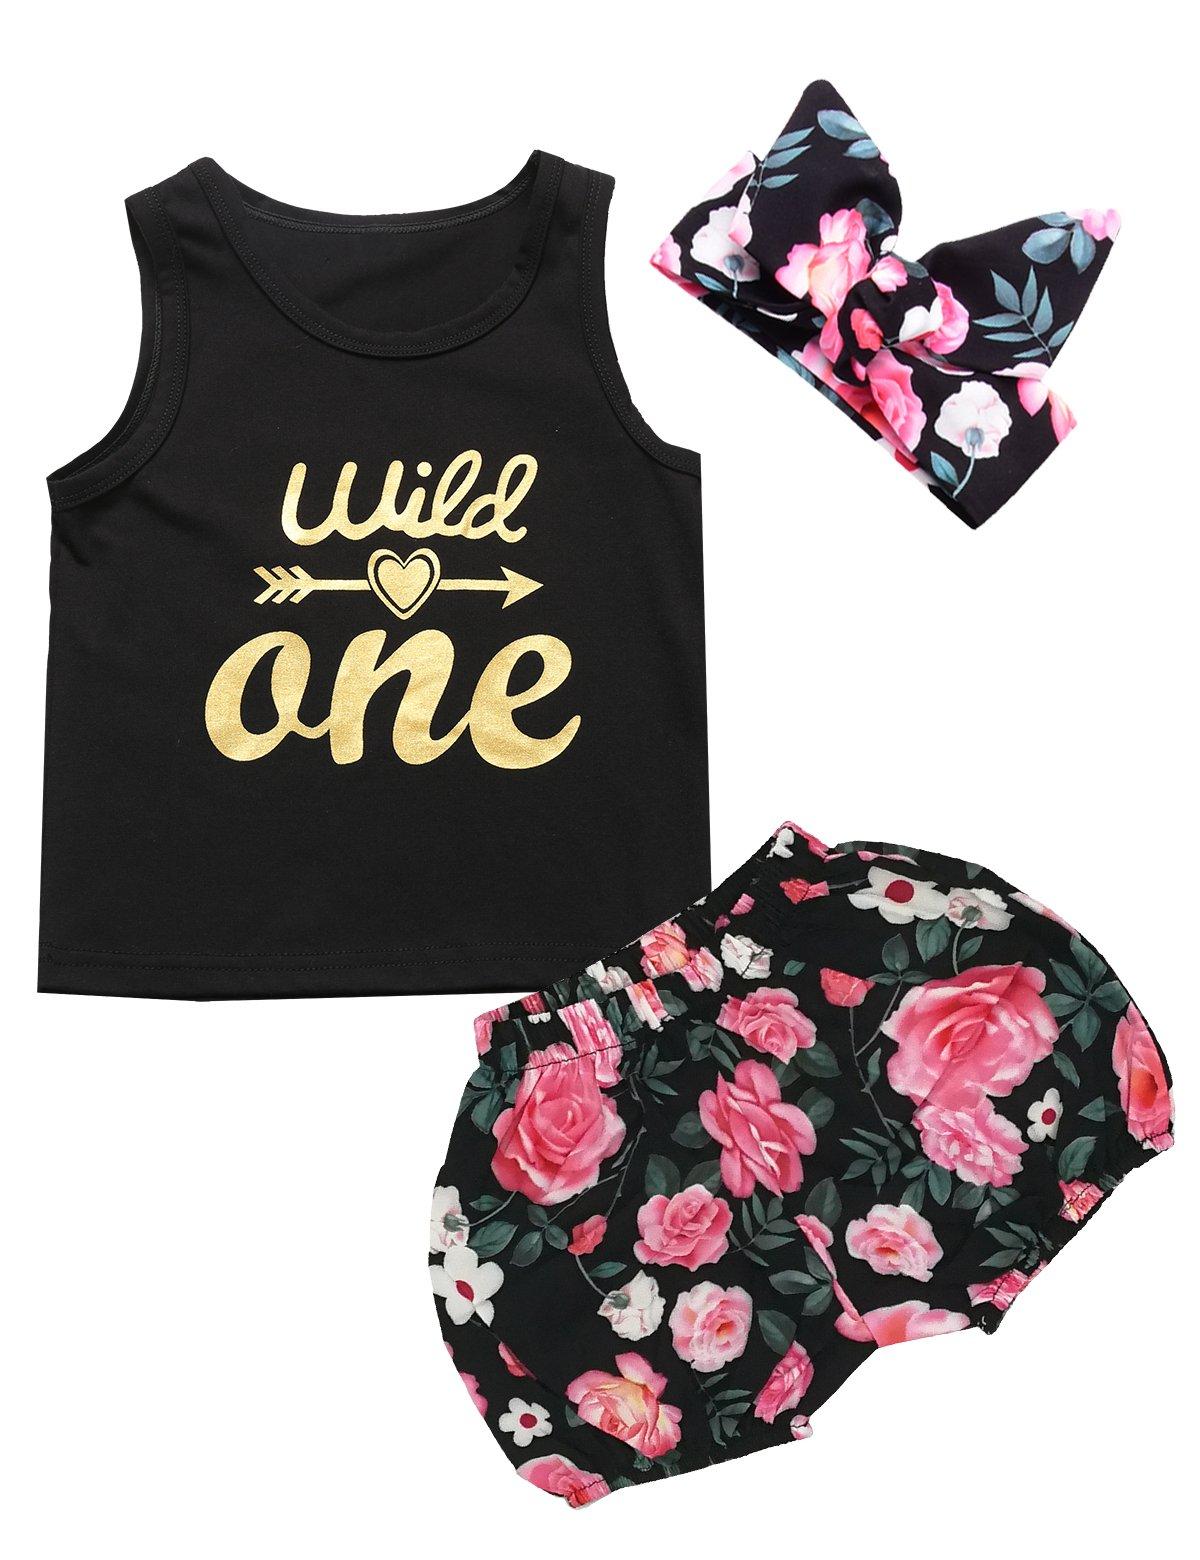 3PCS Outfit Short Set Baby Girls Floral Vest + Pants + Headband (18-24 Months, Black02)